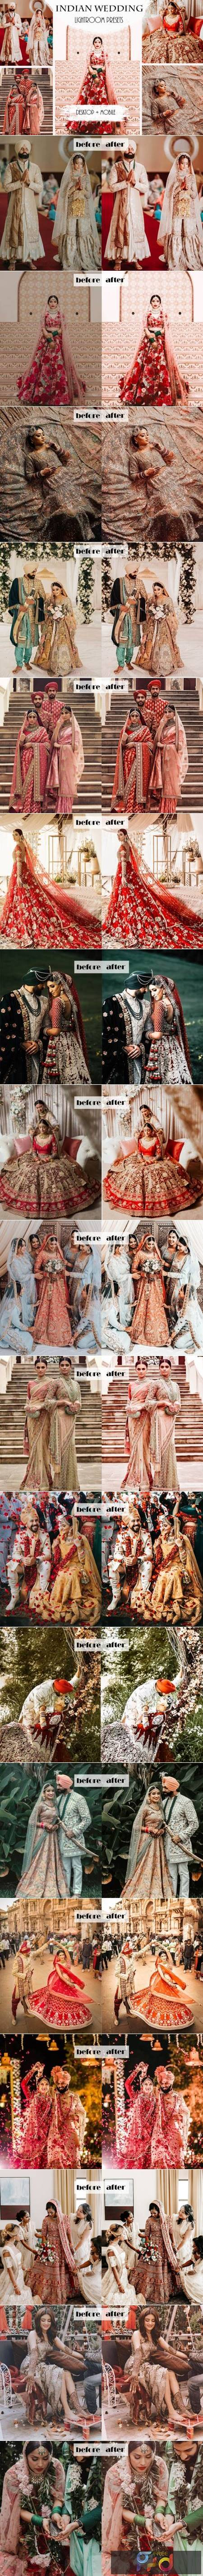 Indian Wedding Lightroom Presets 5455049 1